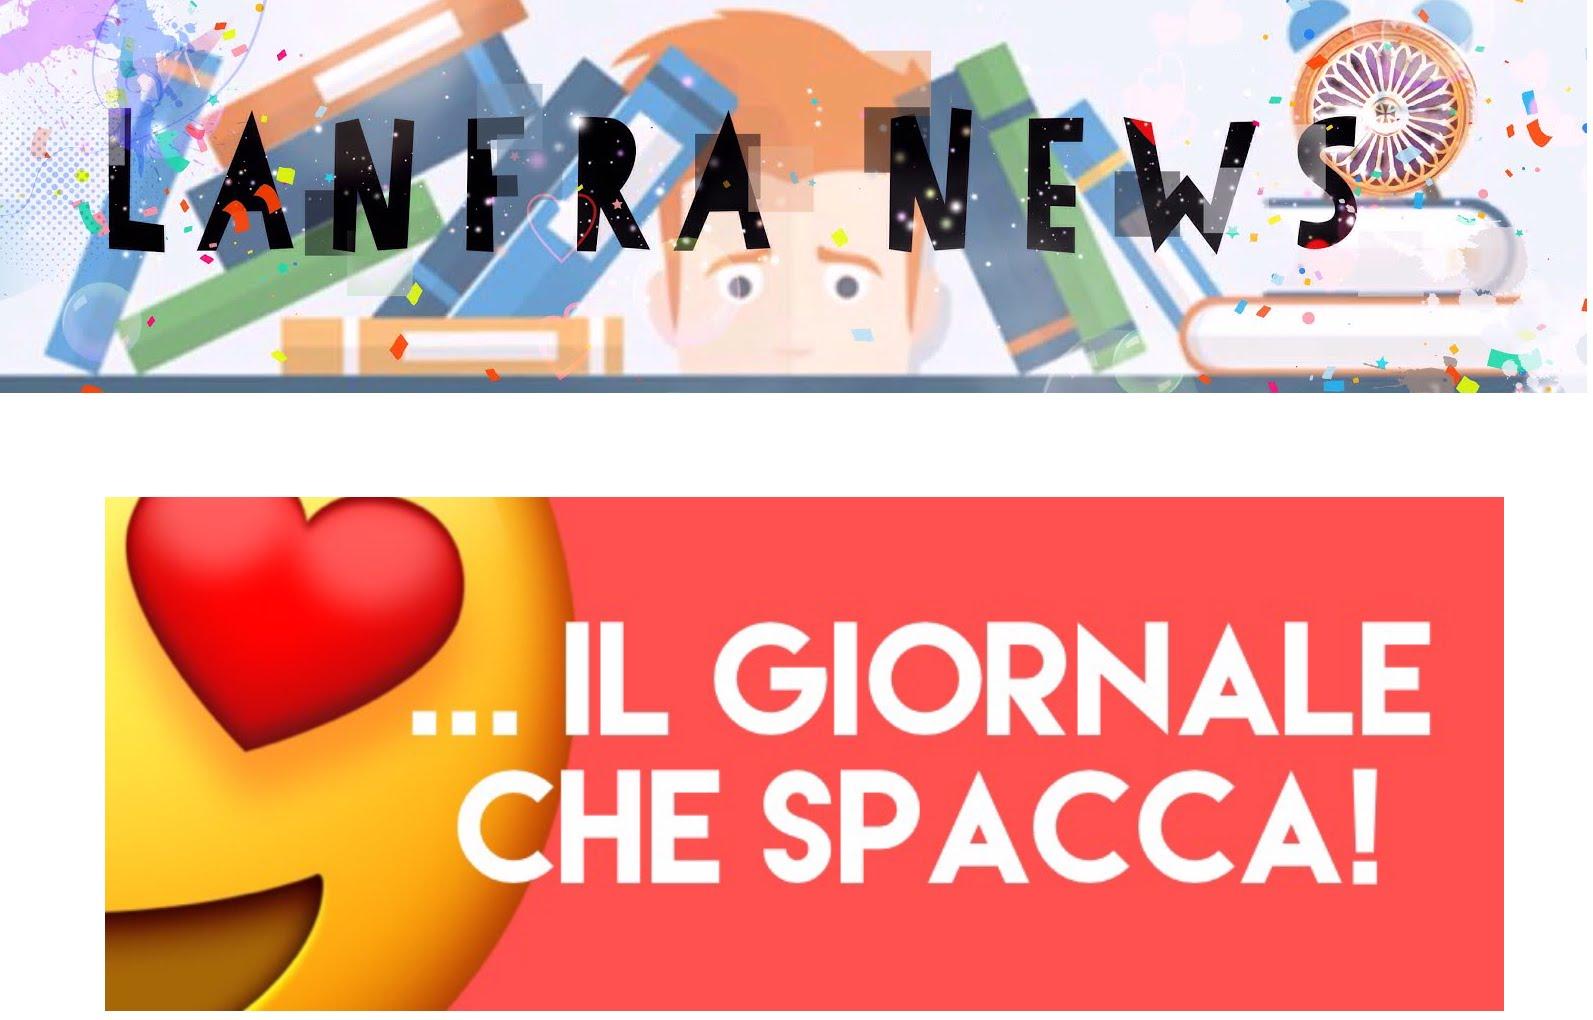 LANFRANCO NEWS